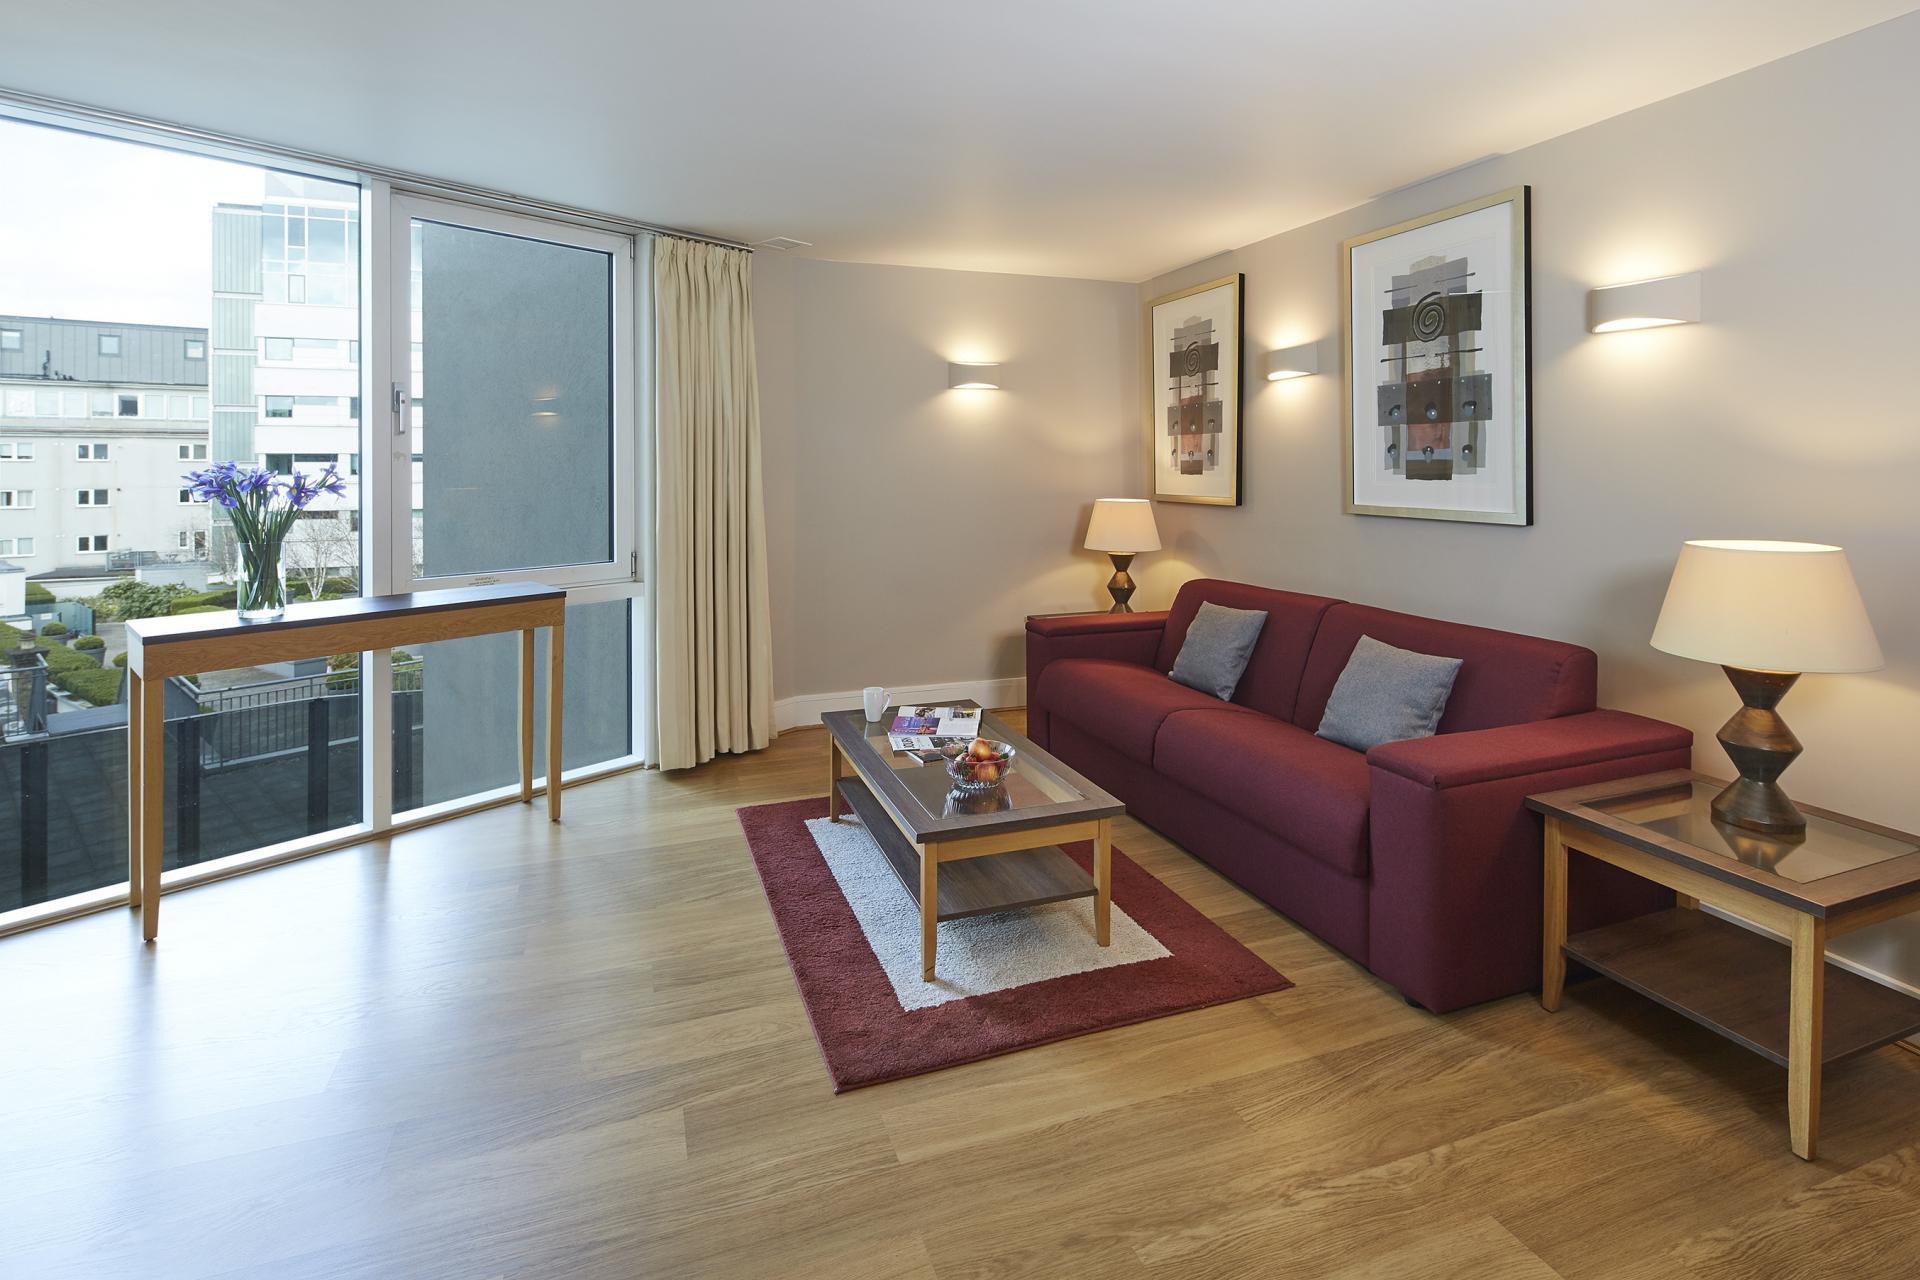 Sofa at Empire Square Apartments, London Bridge, London - Citybase Apartments